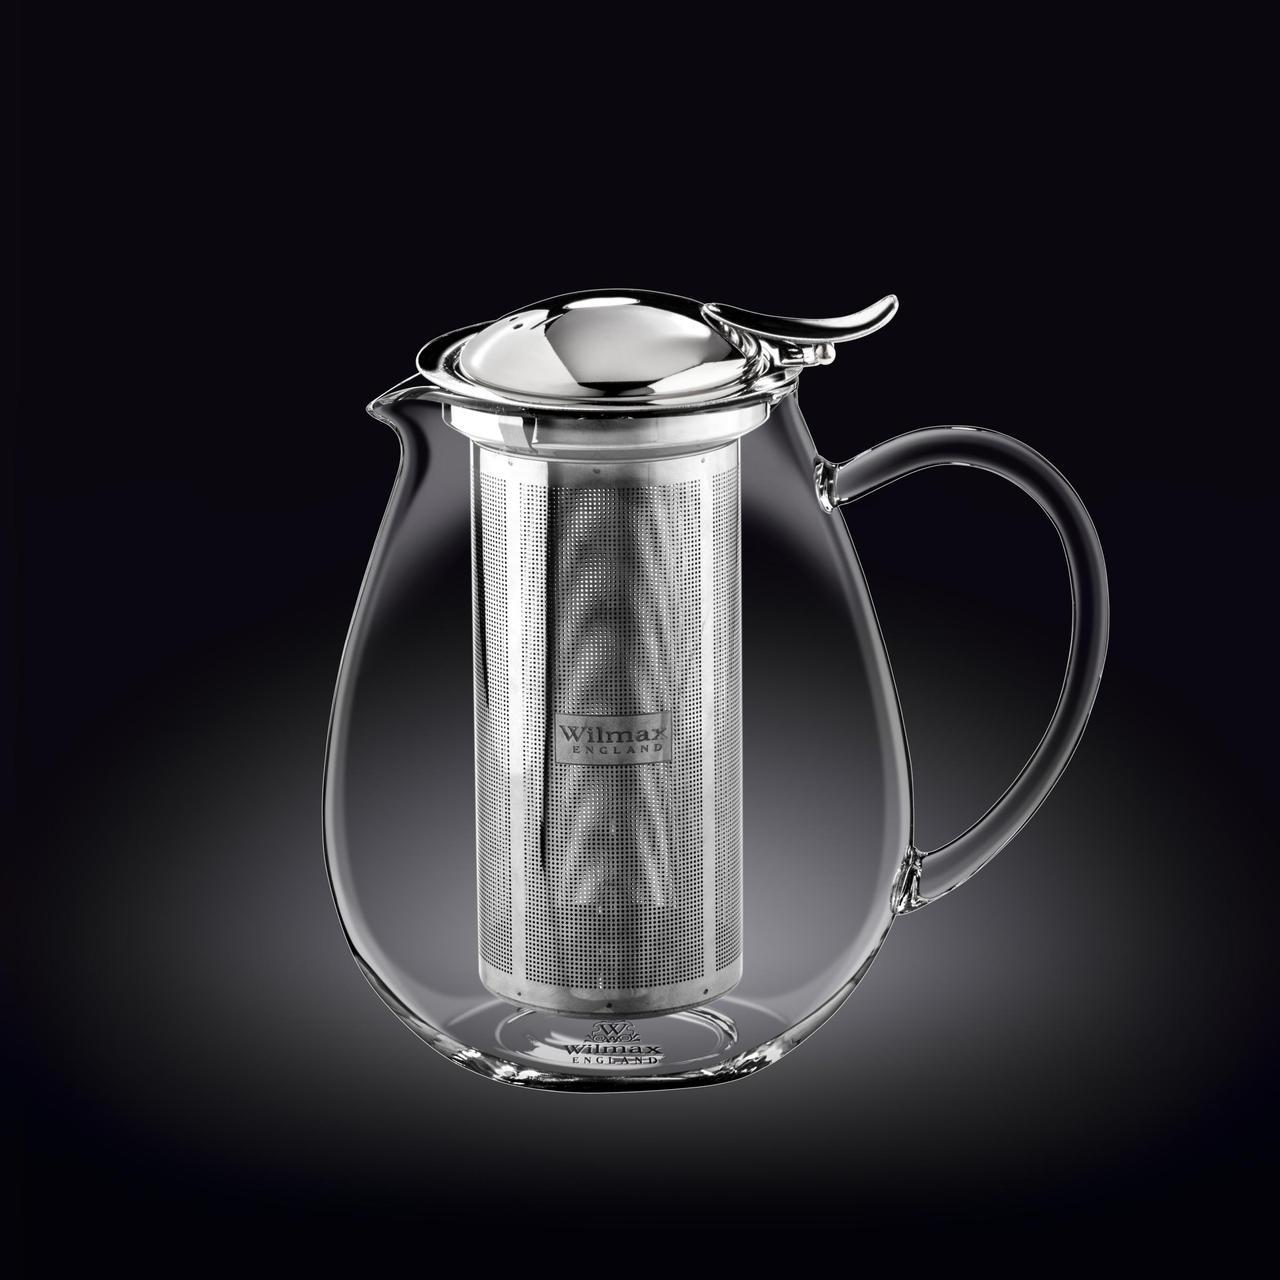 Заварочный чайник с ситечком Wilmax Thermo Glass 1300 мл